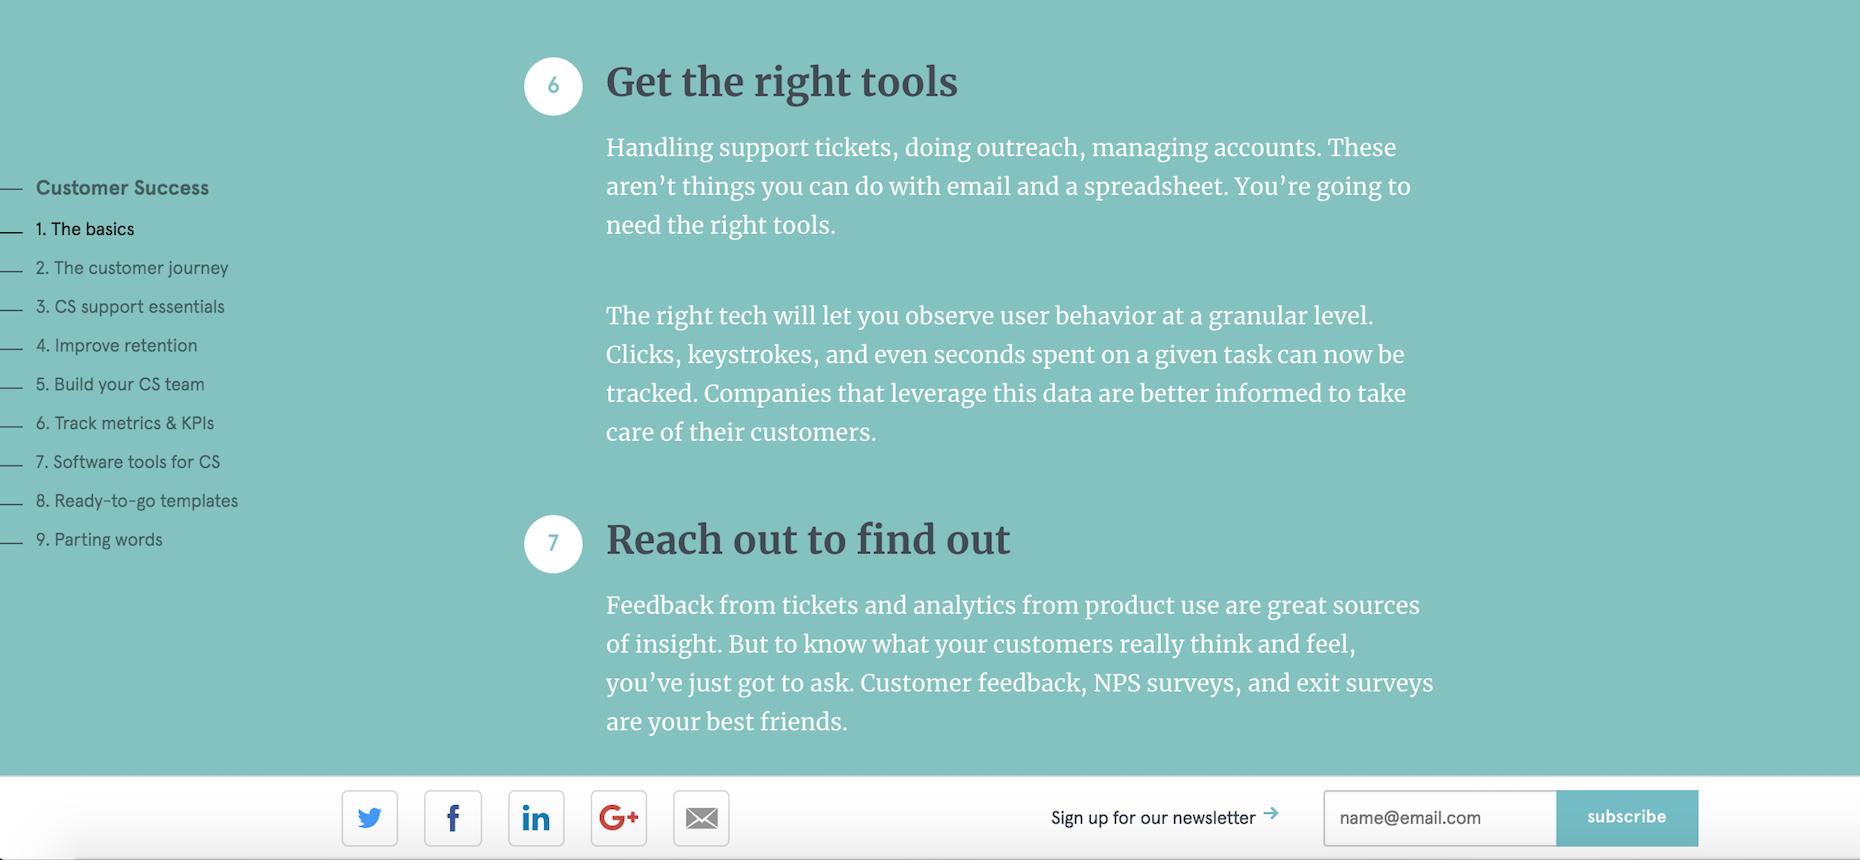 social-media-typeform-example-topic-cluster